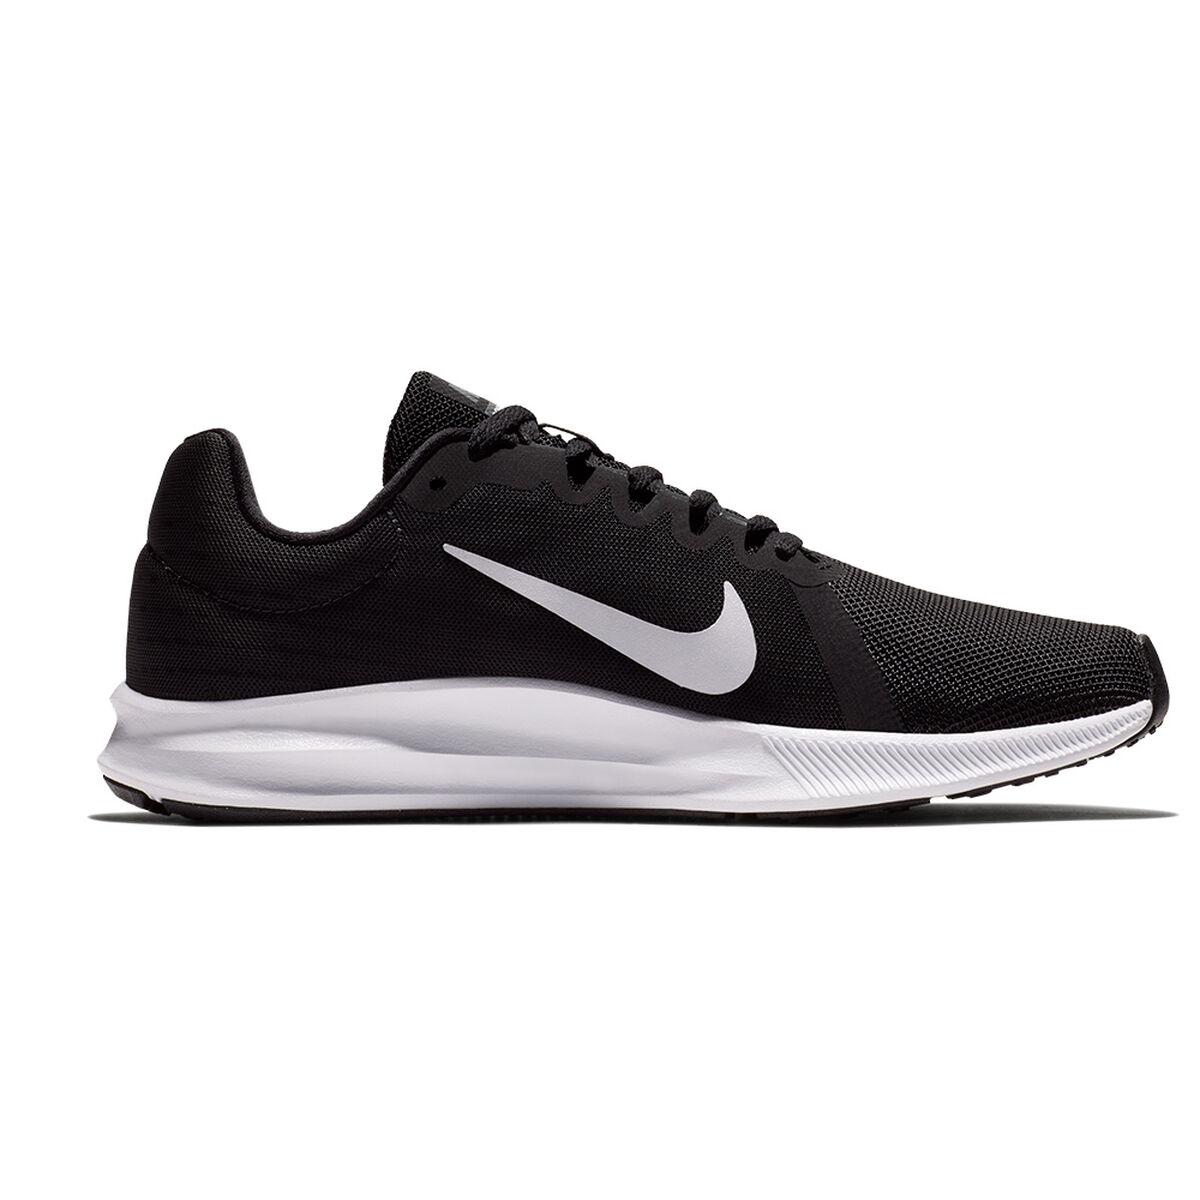 Zapatilla Nike Mujer Running Downshifter 8